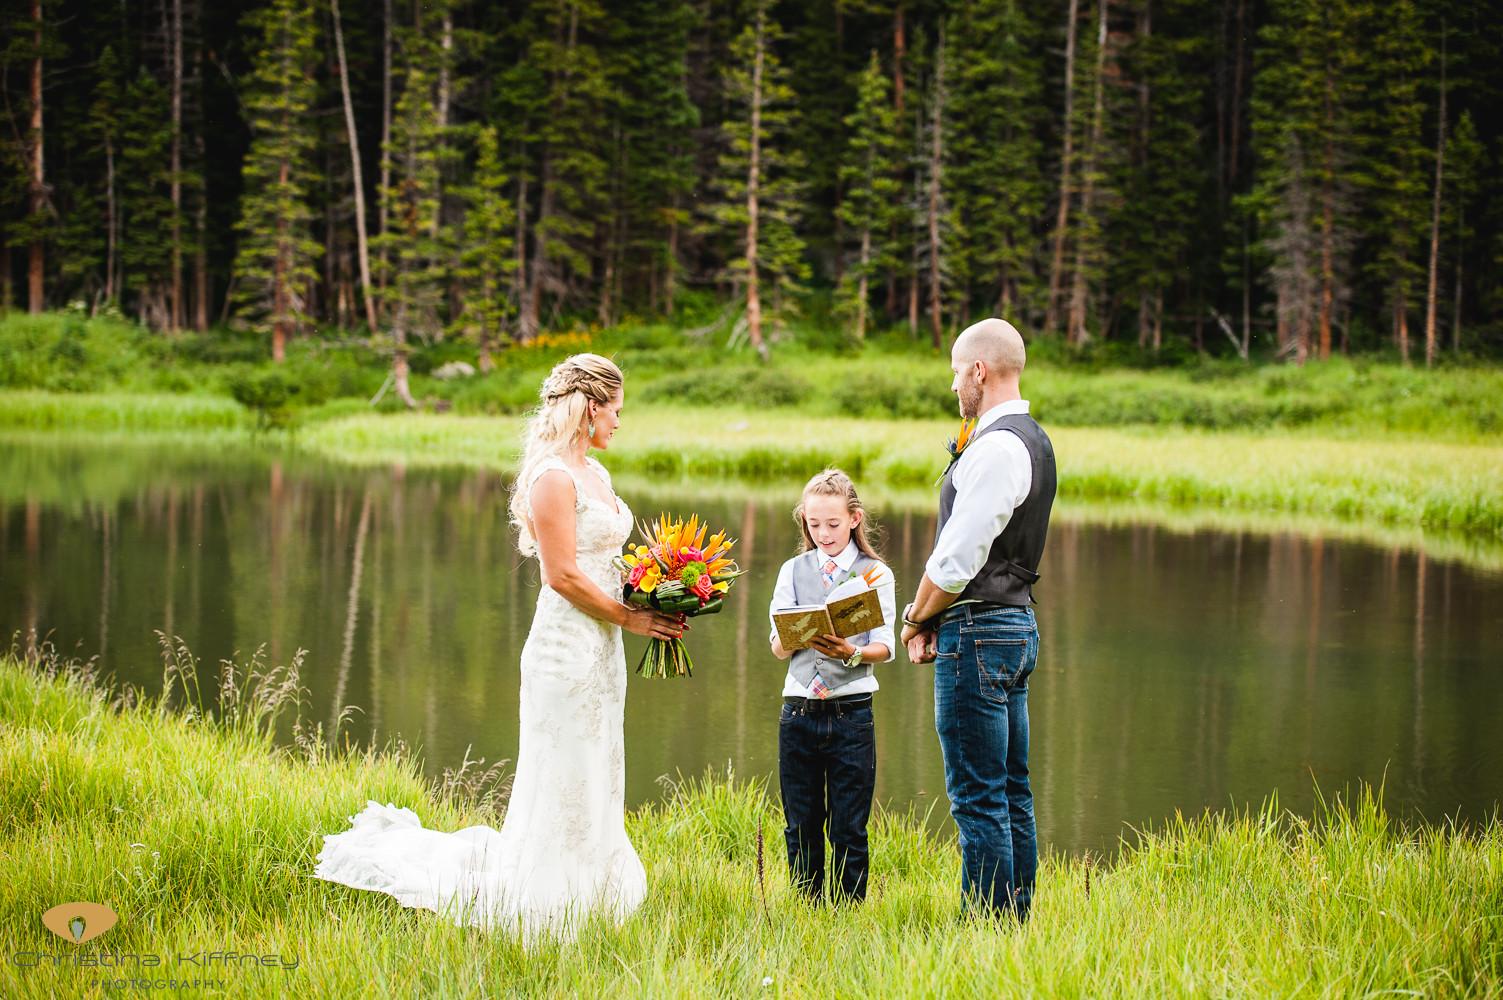 ckp-Colorado-Family-Elopement-0032.jpg